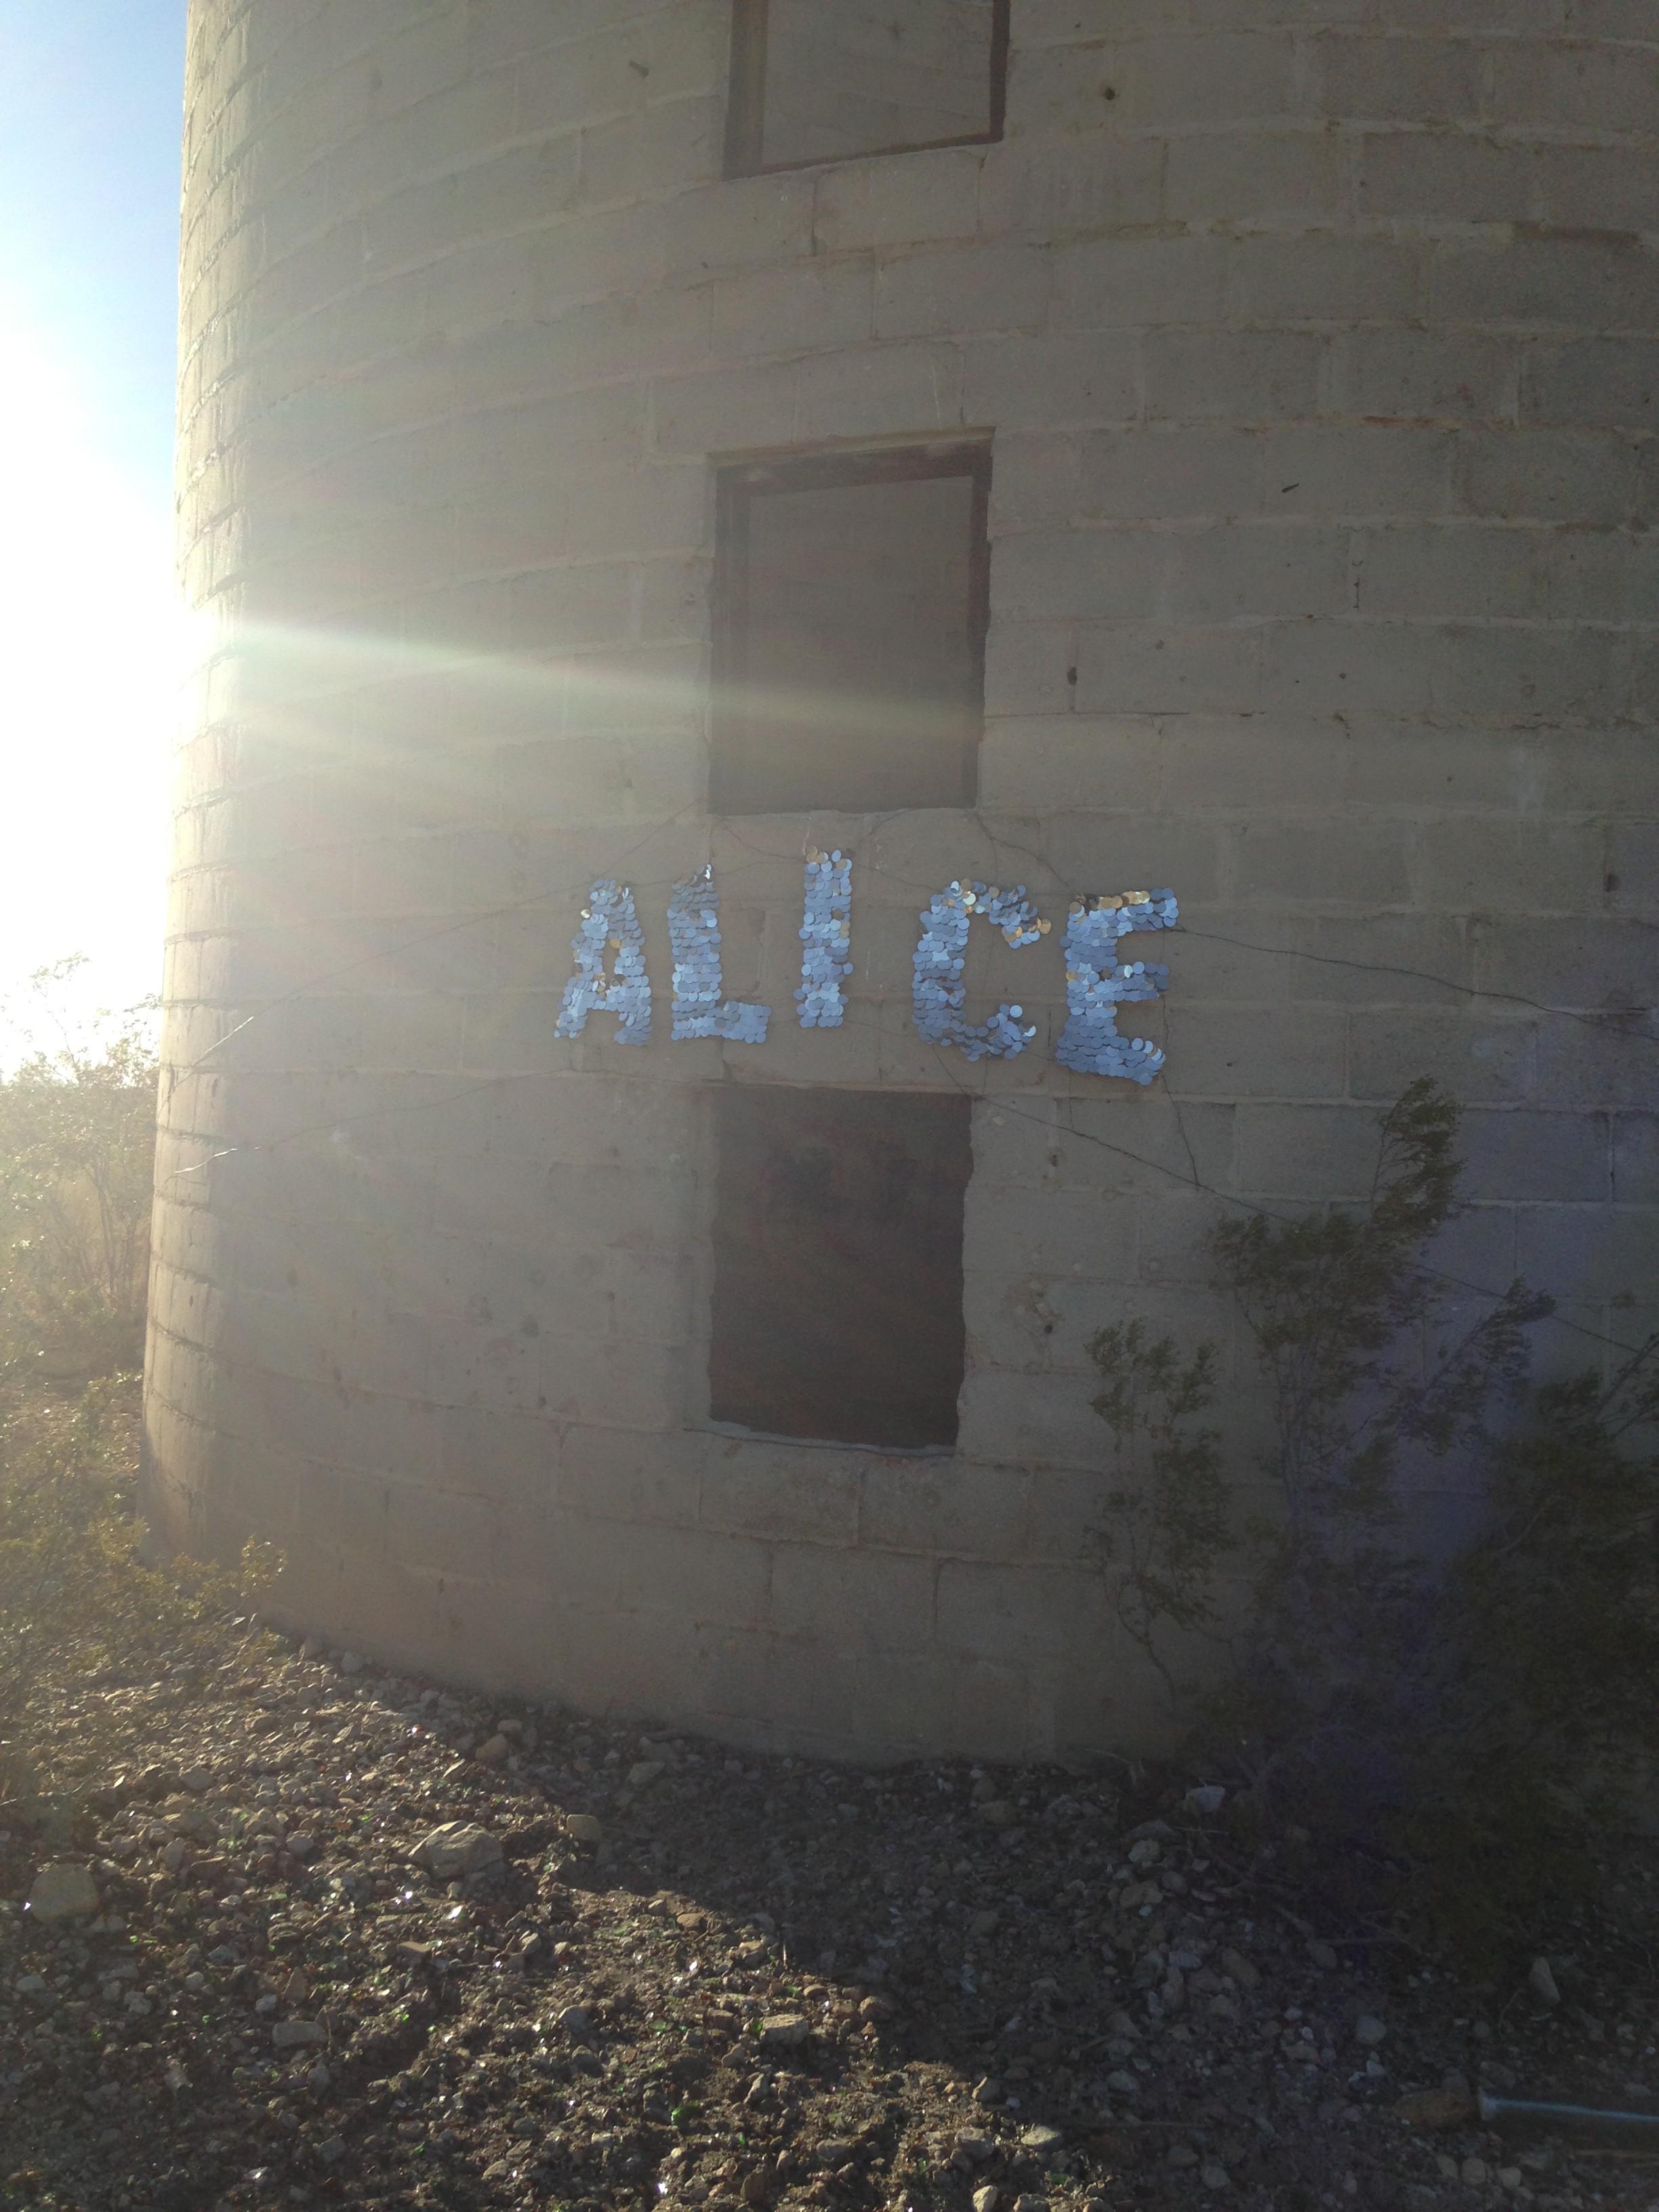 Alice Constance Austin by Karyl Newman at Llano del Rio